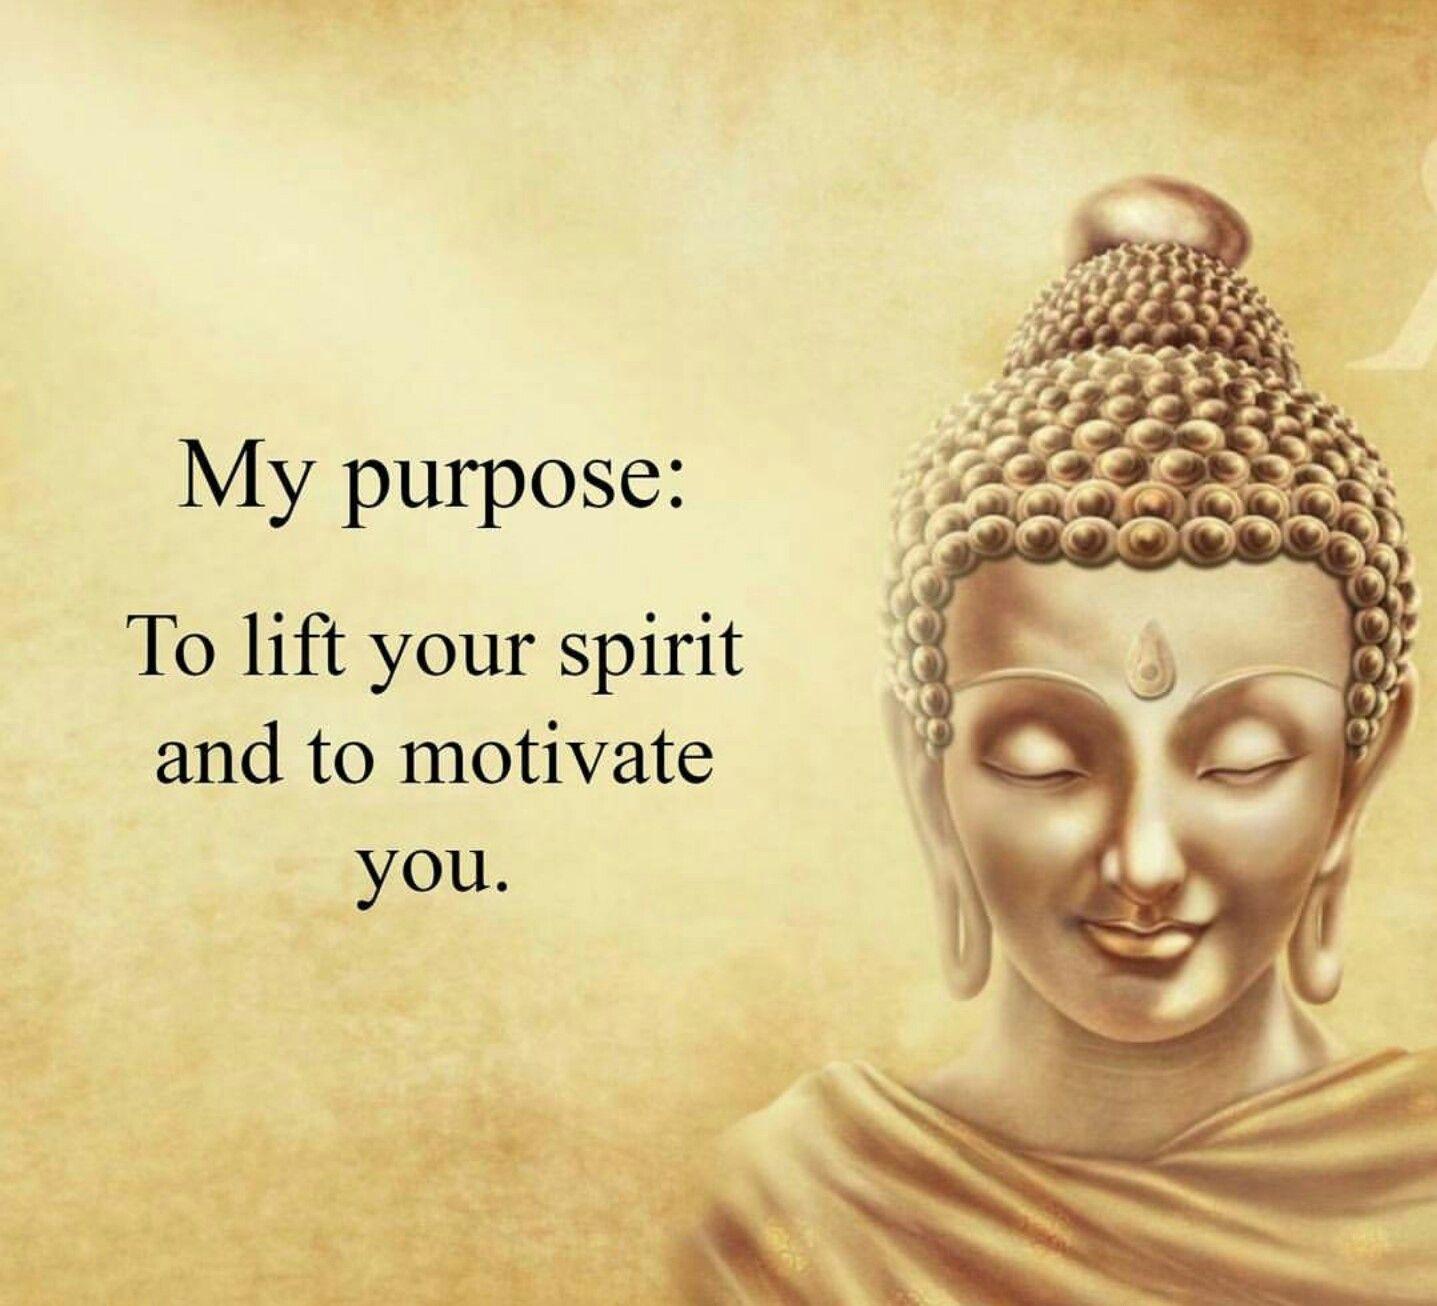 Exceptionnel Reiki Quotes, Hindu Quotes, Buddhist Quotes, Buddhist Teachings, Good Quotes,  Quotes Quotes, Life Quotes, Buddha Buddhism, Buddha Zen